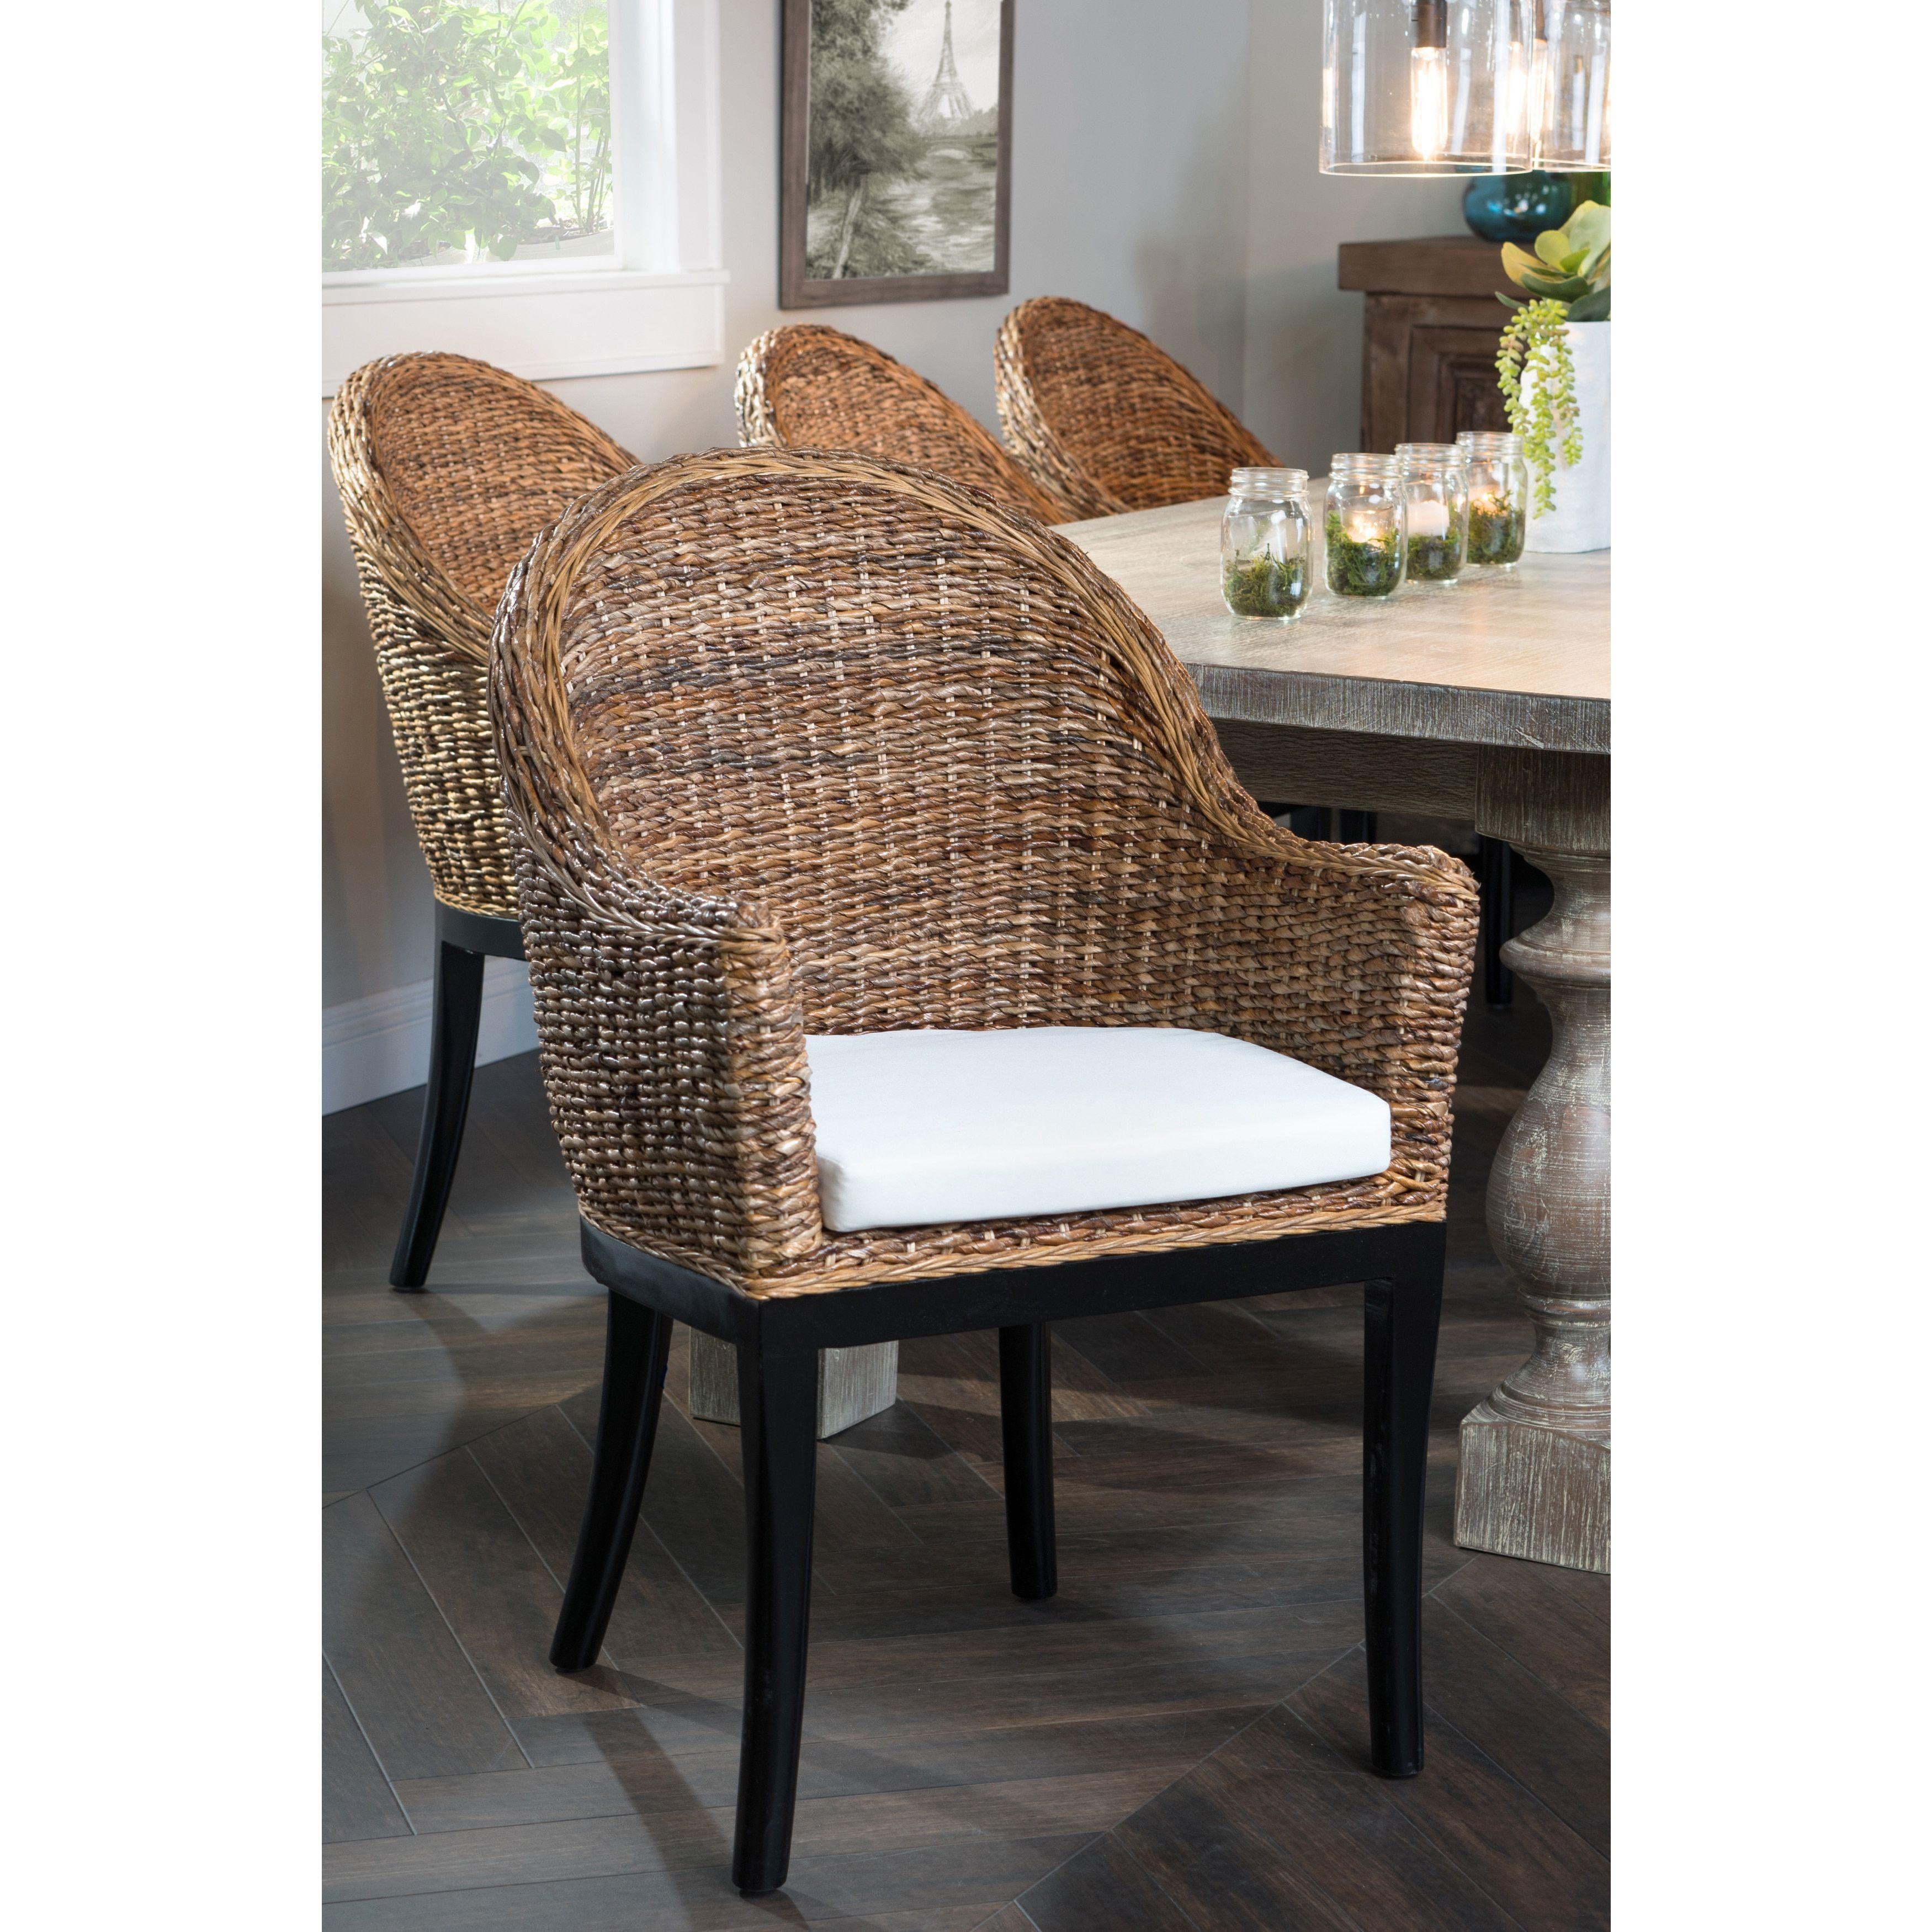 Owen Rattan Dining Chair By Kosas Home Natural Black Mahogany